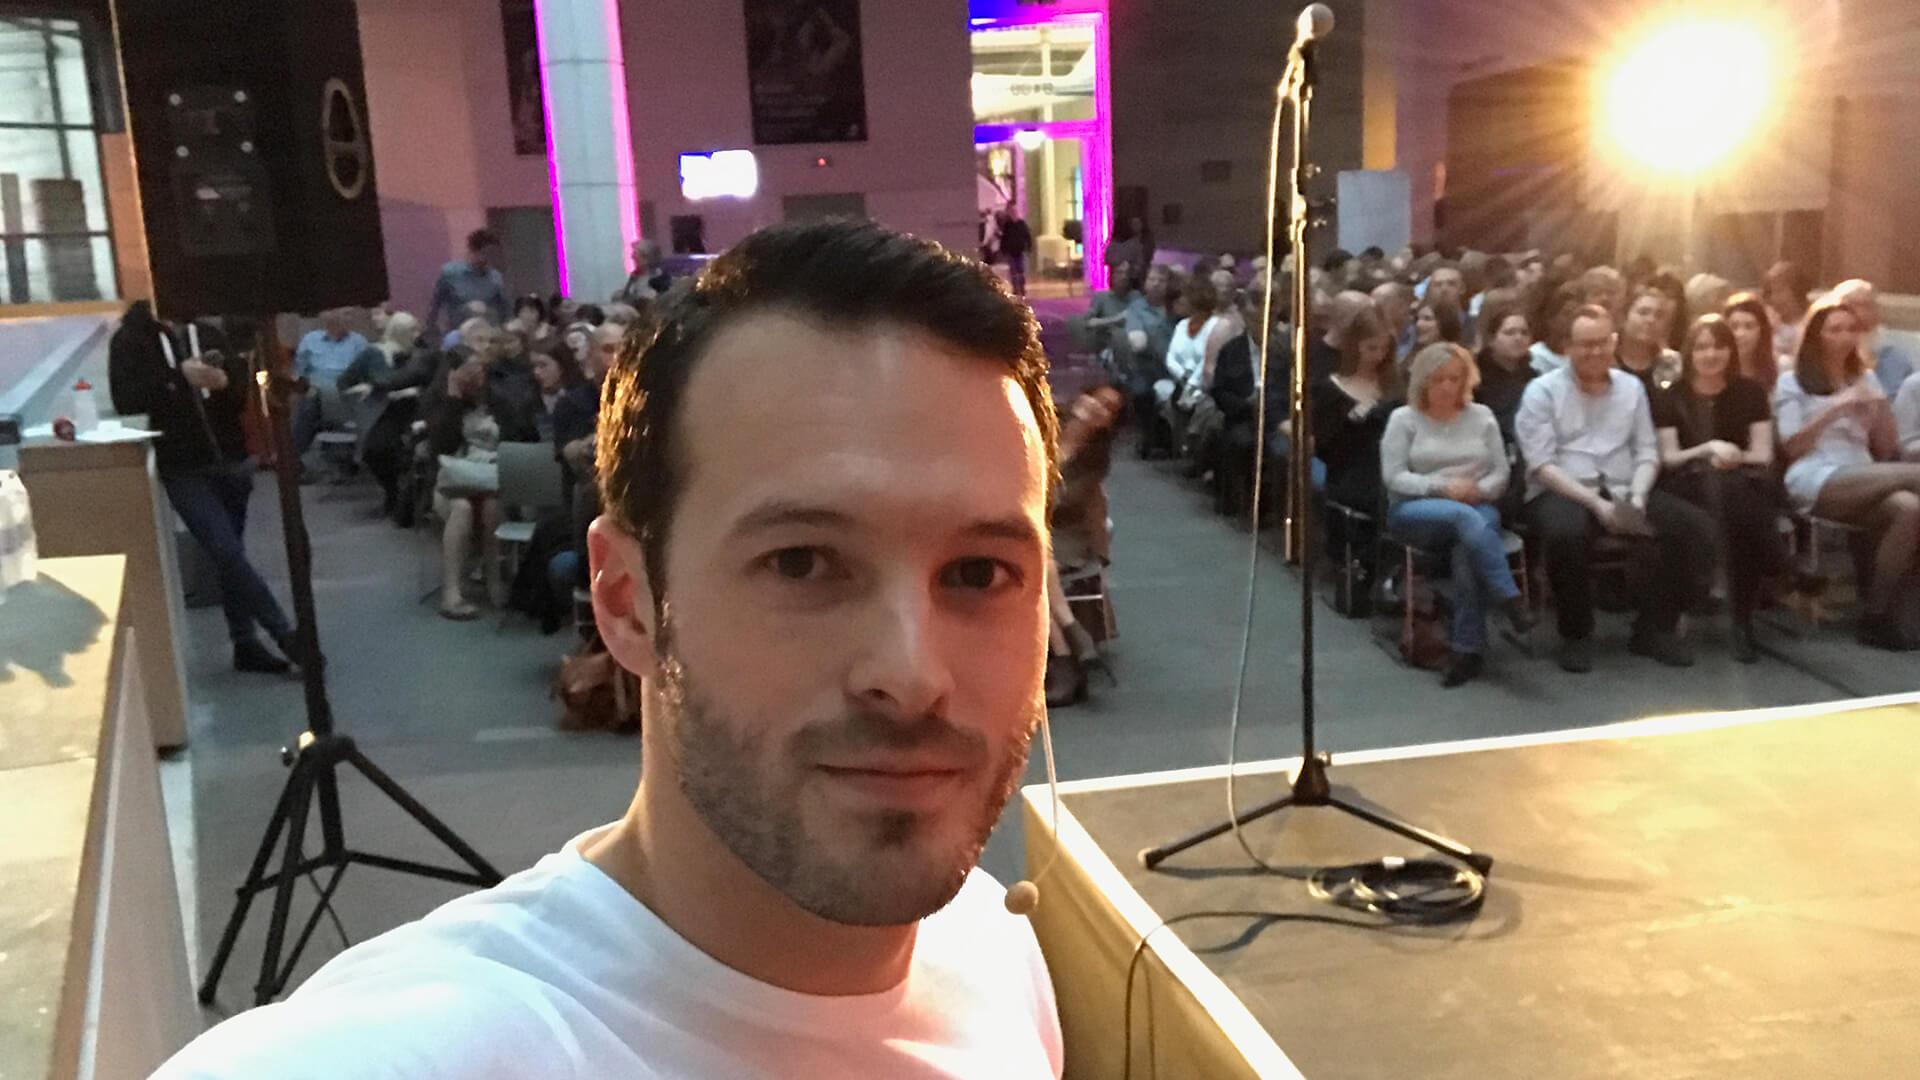 Guest stage entertainment selfie